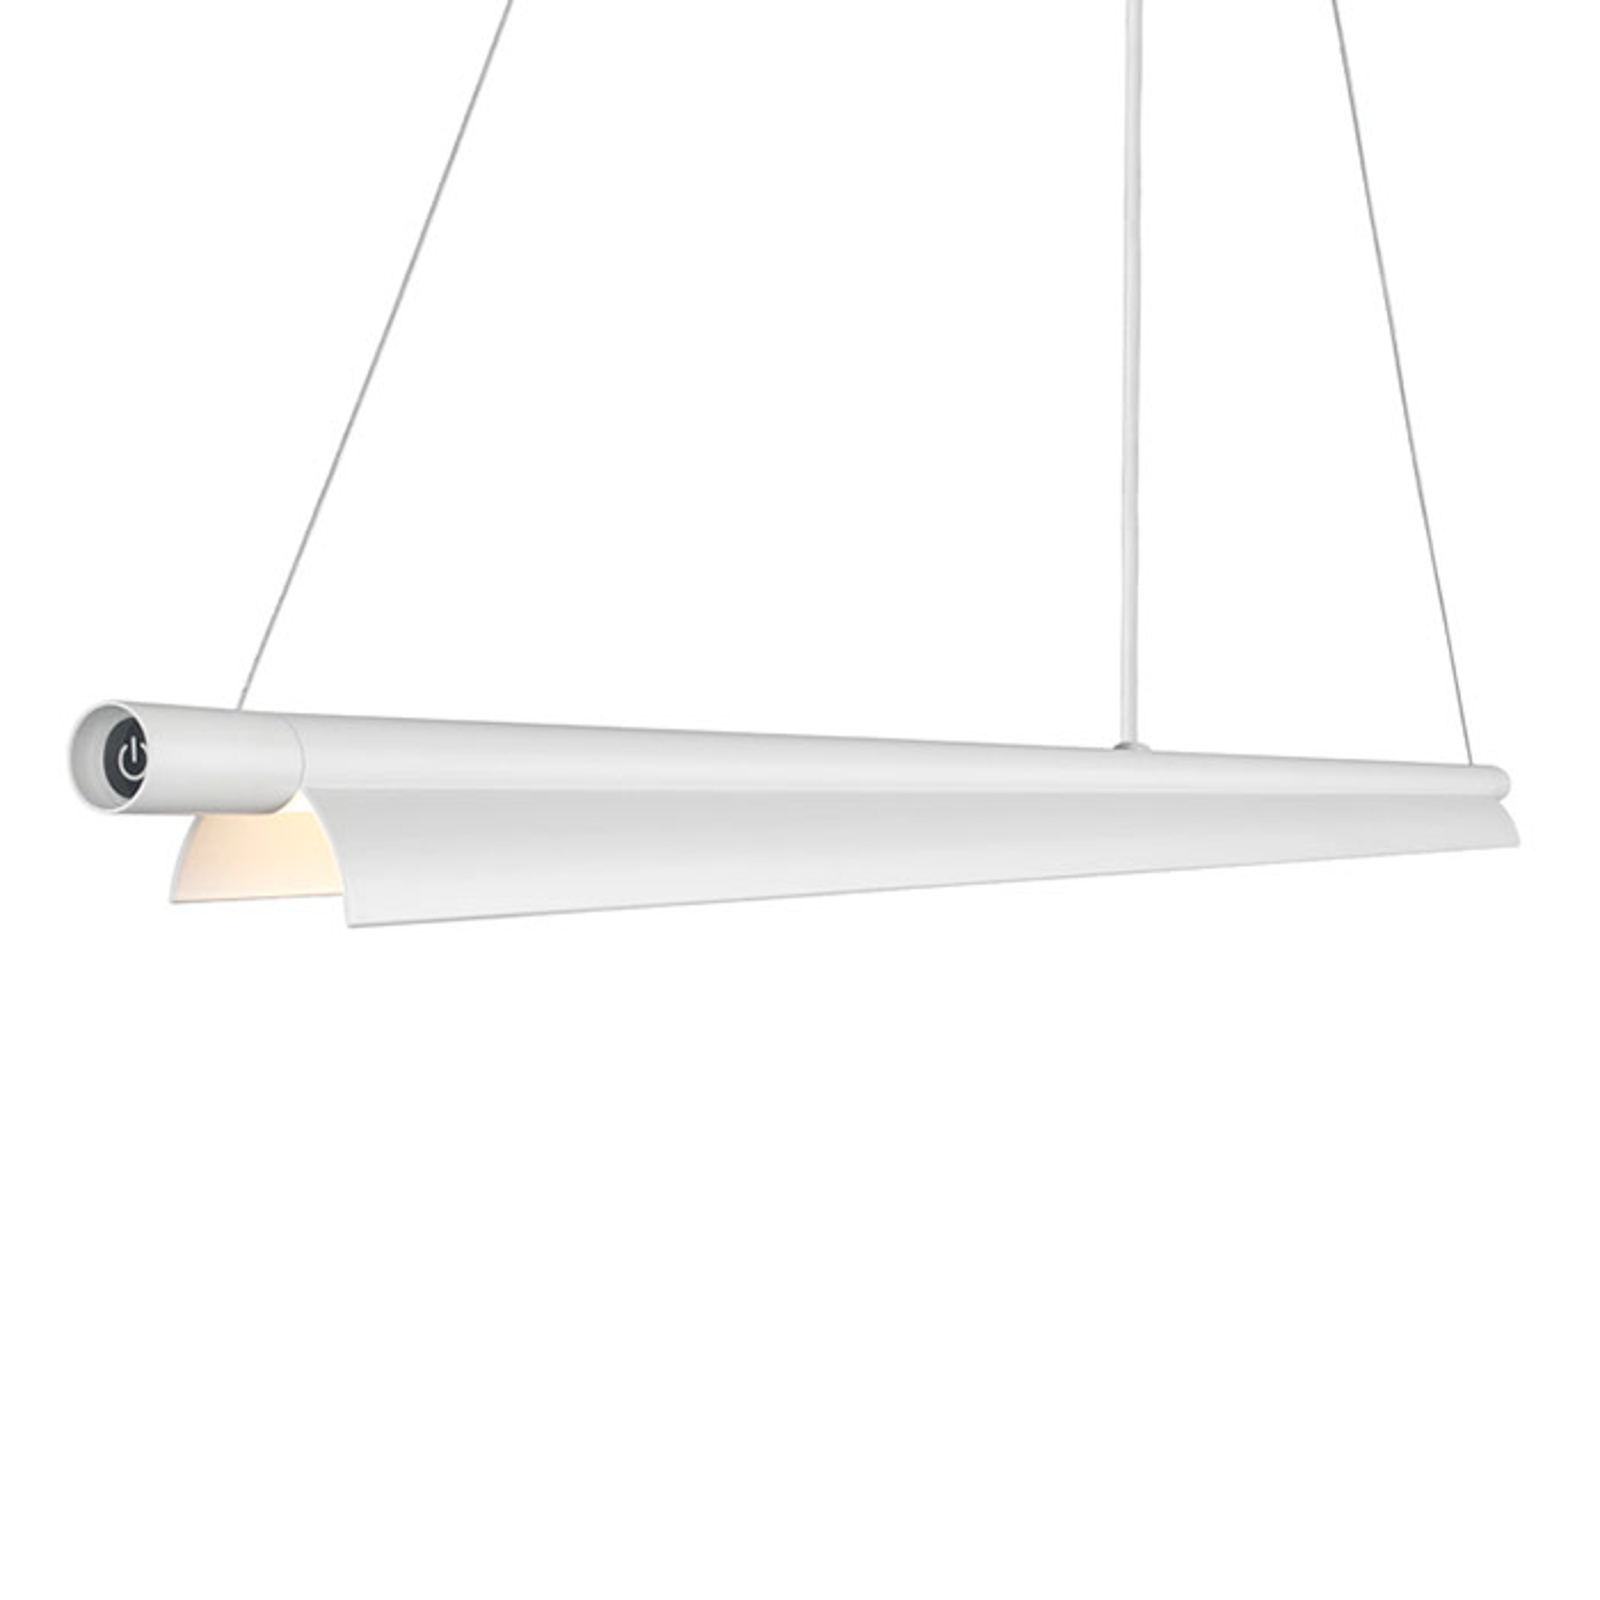 Aflang LED-pendellampe Space B hvid